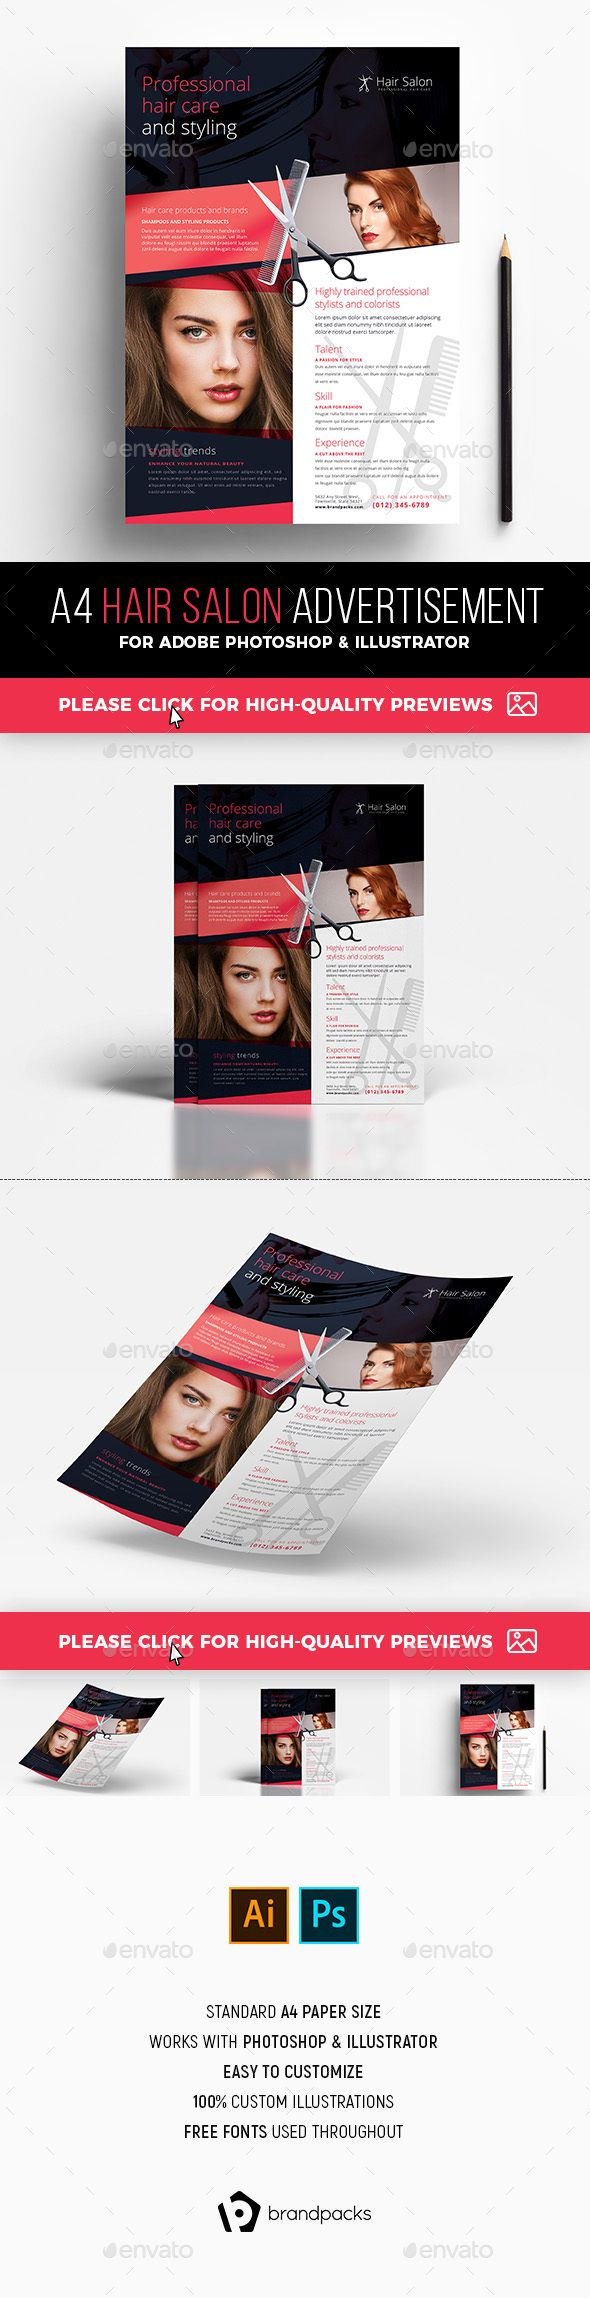 #Hair Salon Advertisement Template - #Commerce #Flyers